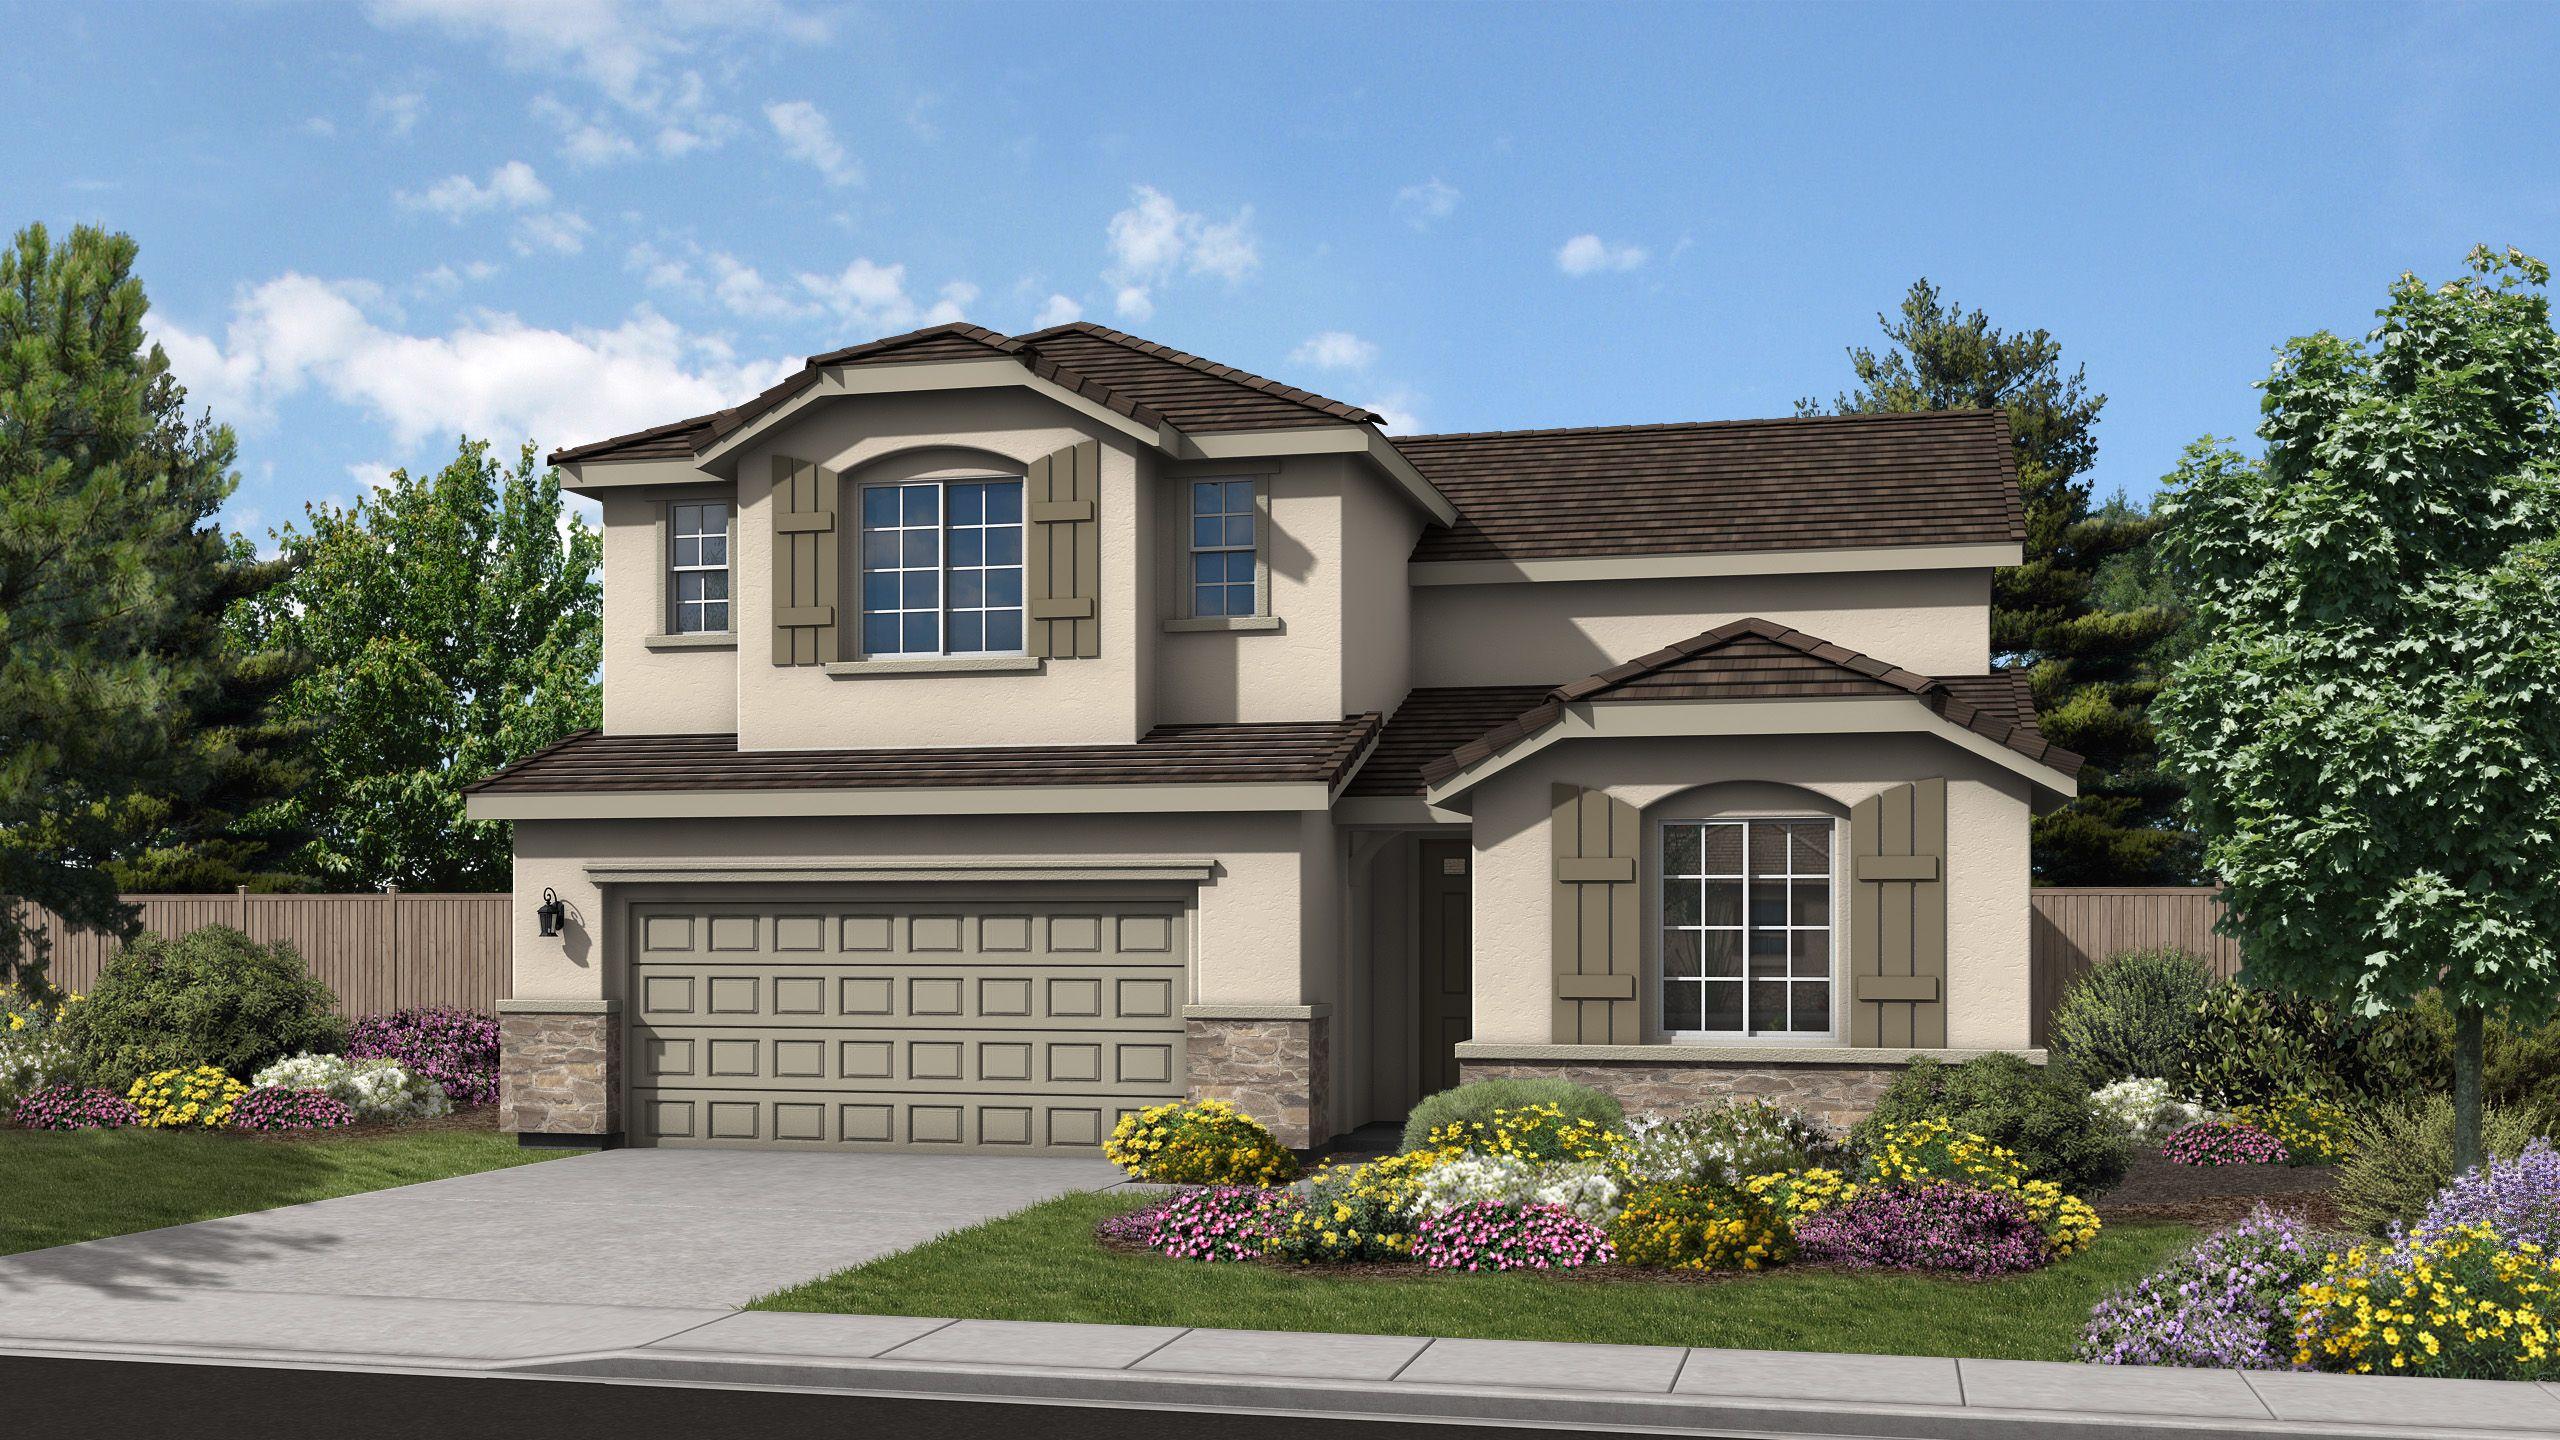 bright homes pomelo grove imperial 1073559 manteca ca new home for sale homegain